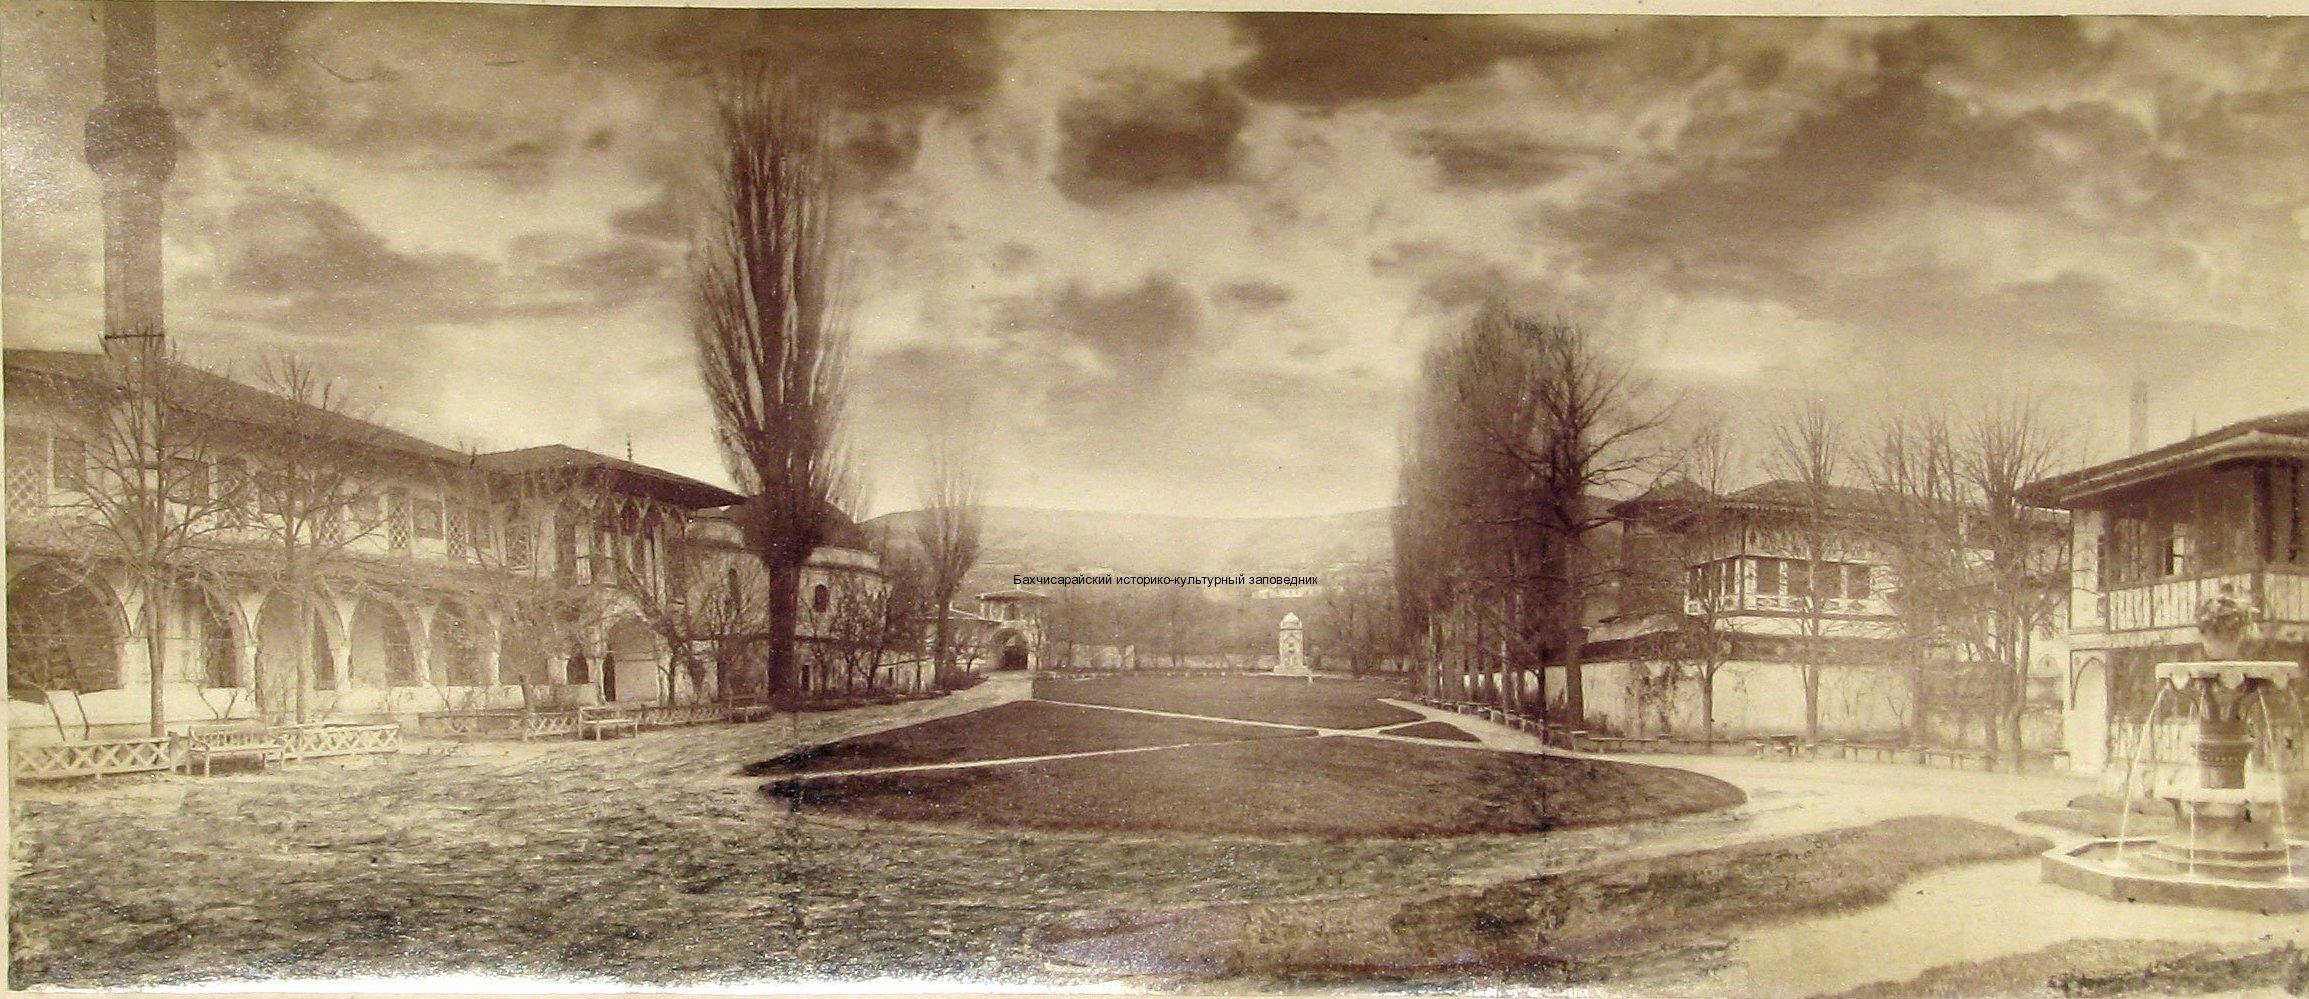 Главный двор дворца. Вид от входа